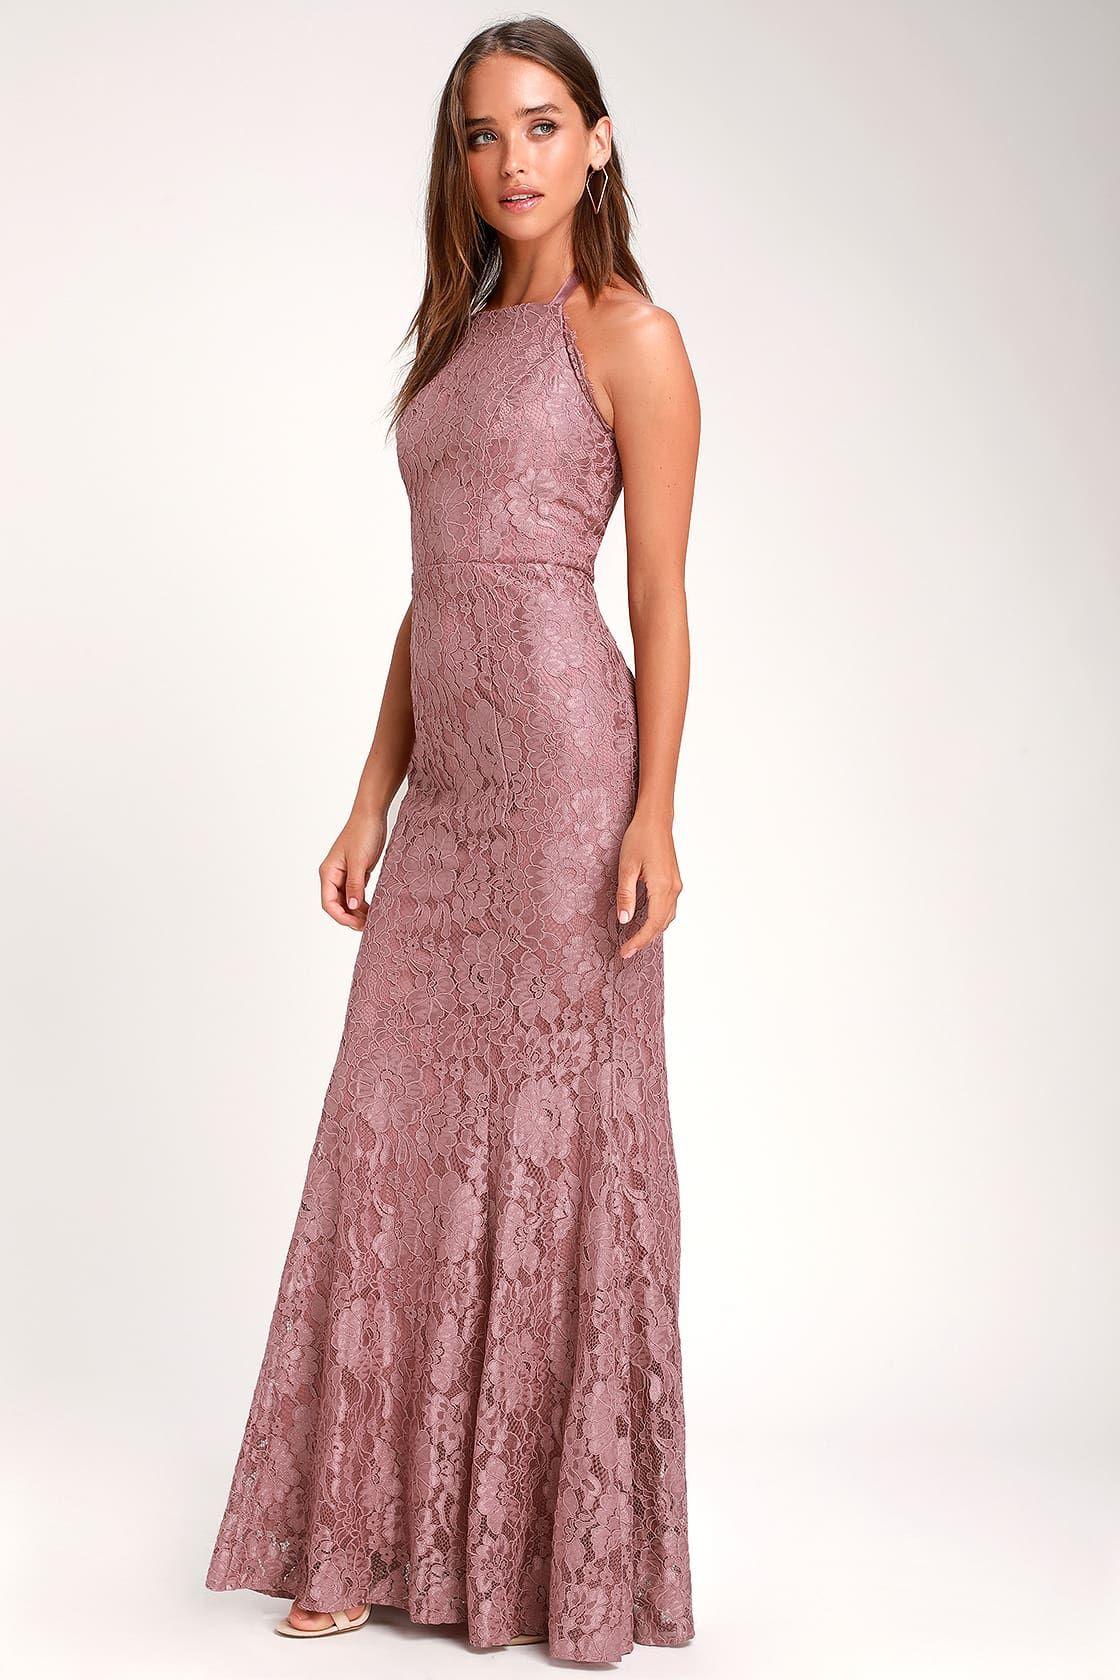 Every Memory Mauve Lace Halter Maxi Dress Maxi Dress Halter Maxi Dresses Dresses